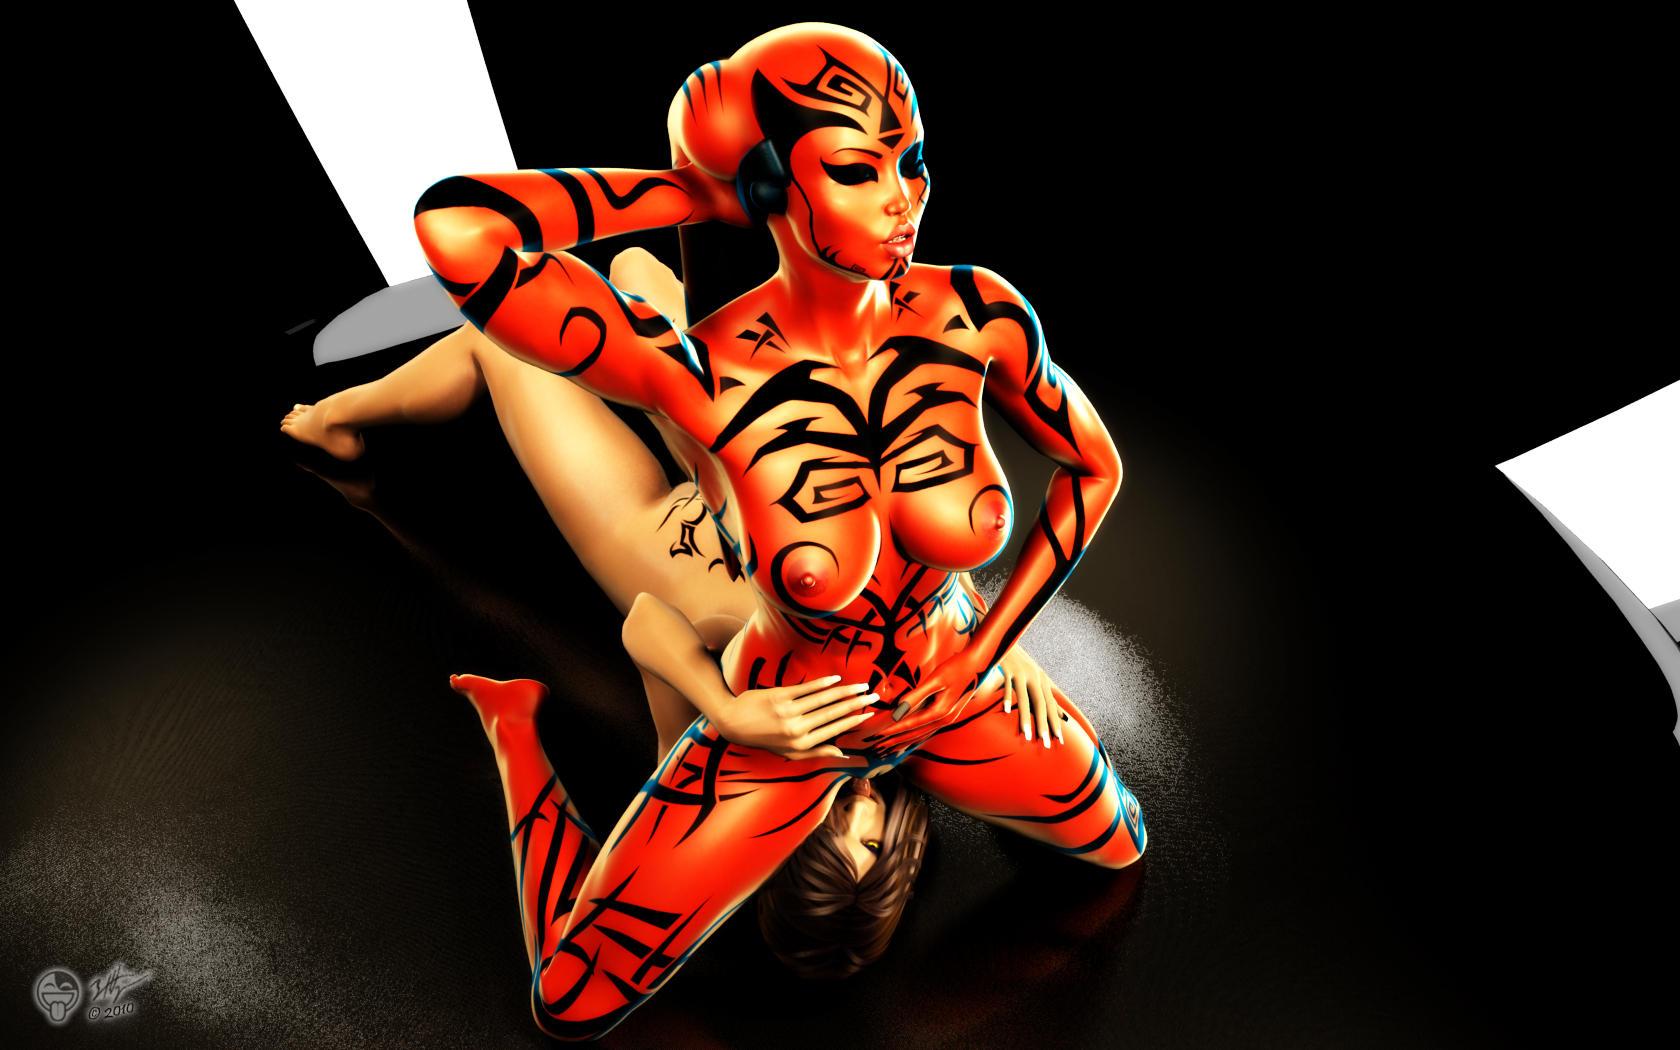 talon darth hot wars star The hanasia, queen of all saiyans